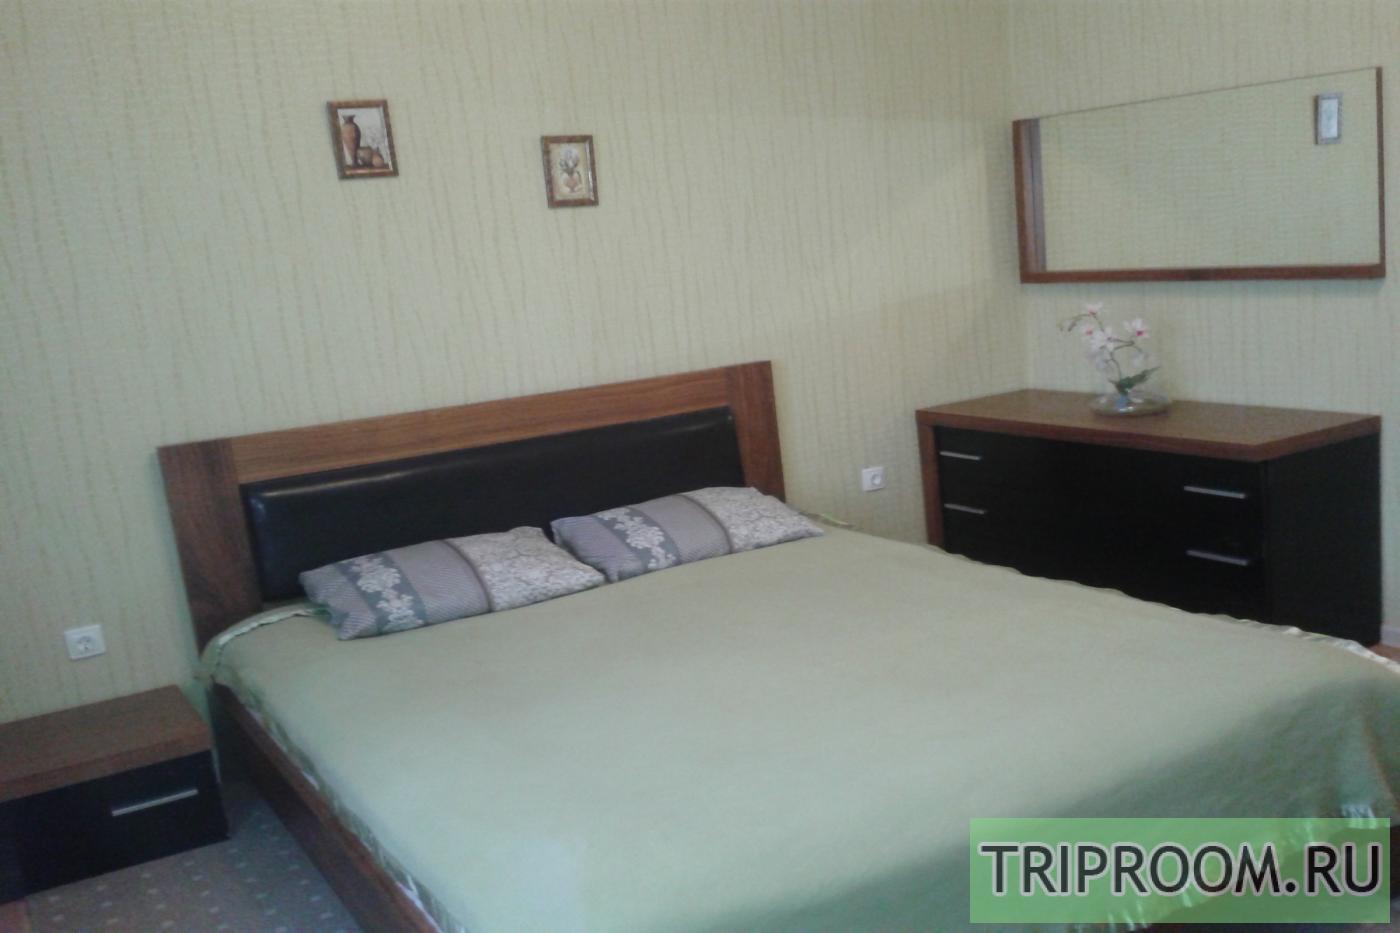 2-комнатная квартира посуточно (вариант № 15849), ул. Аделя Кутуя улица, фото № 2